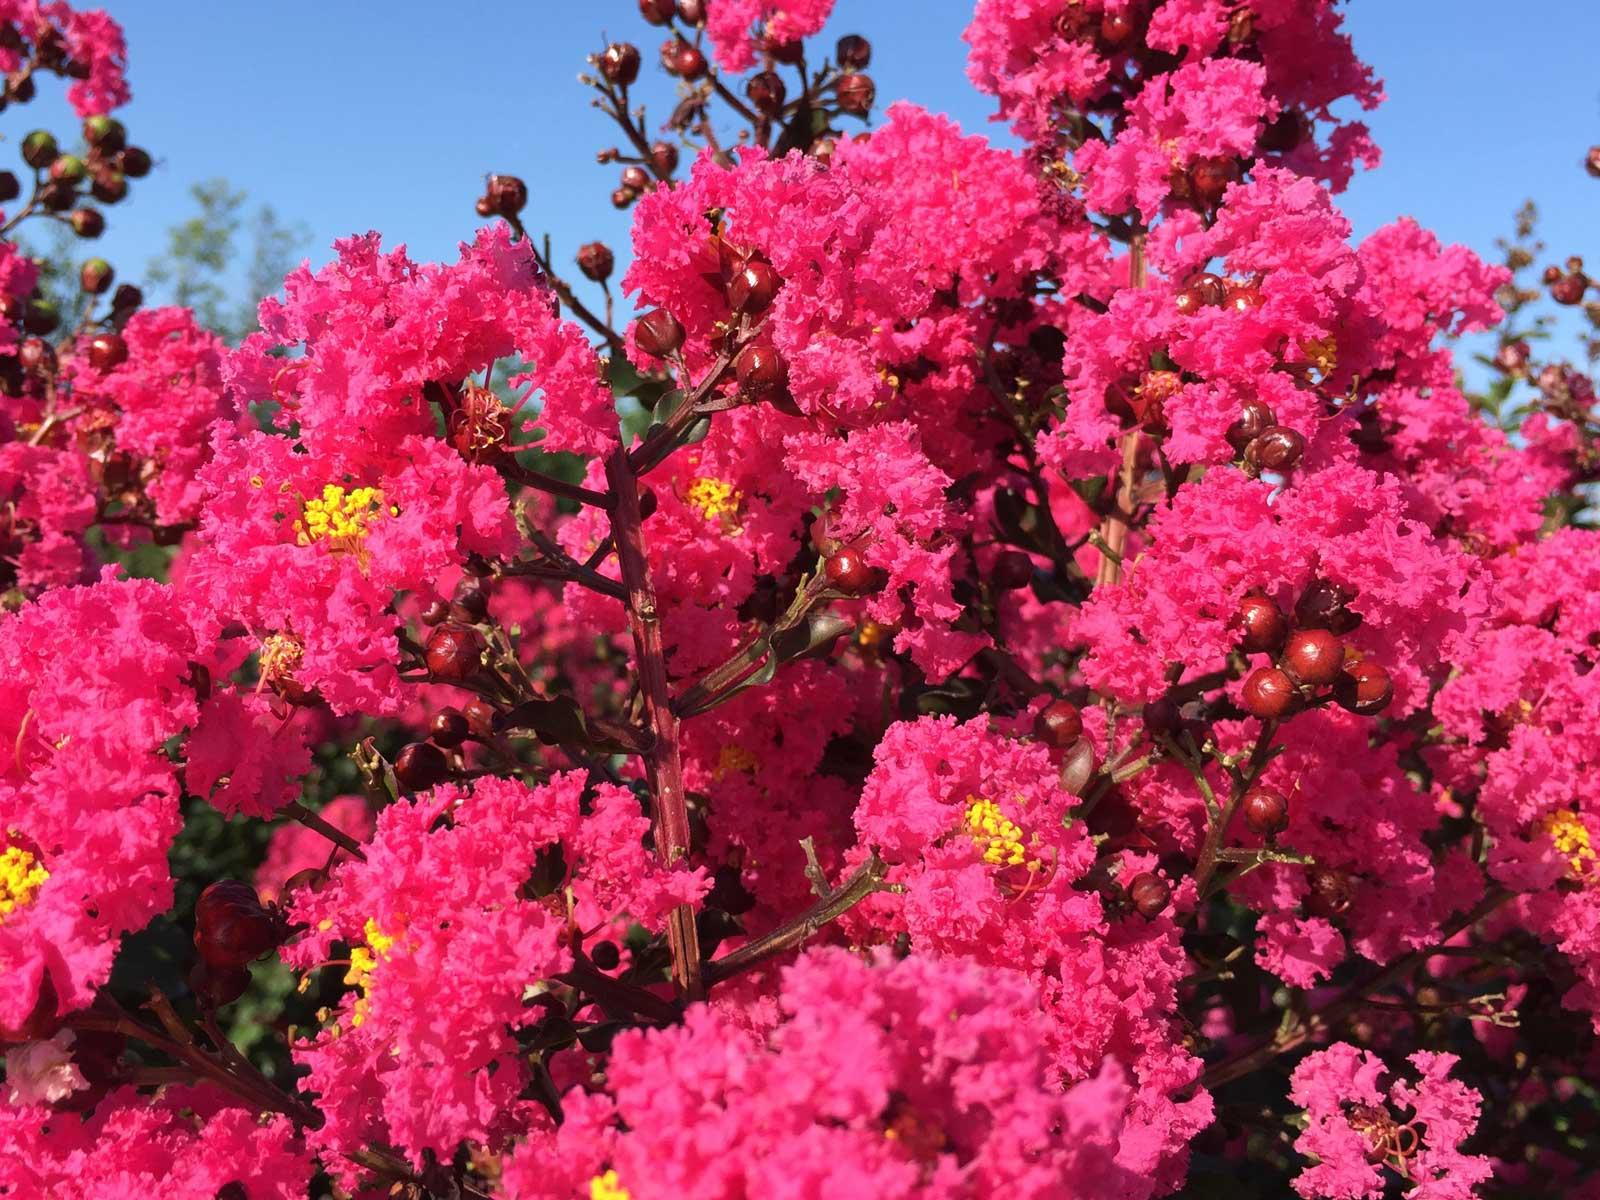 Crape myrtle tree 'Pink Velour' summer blooms